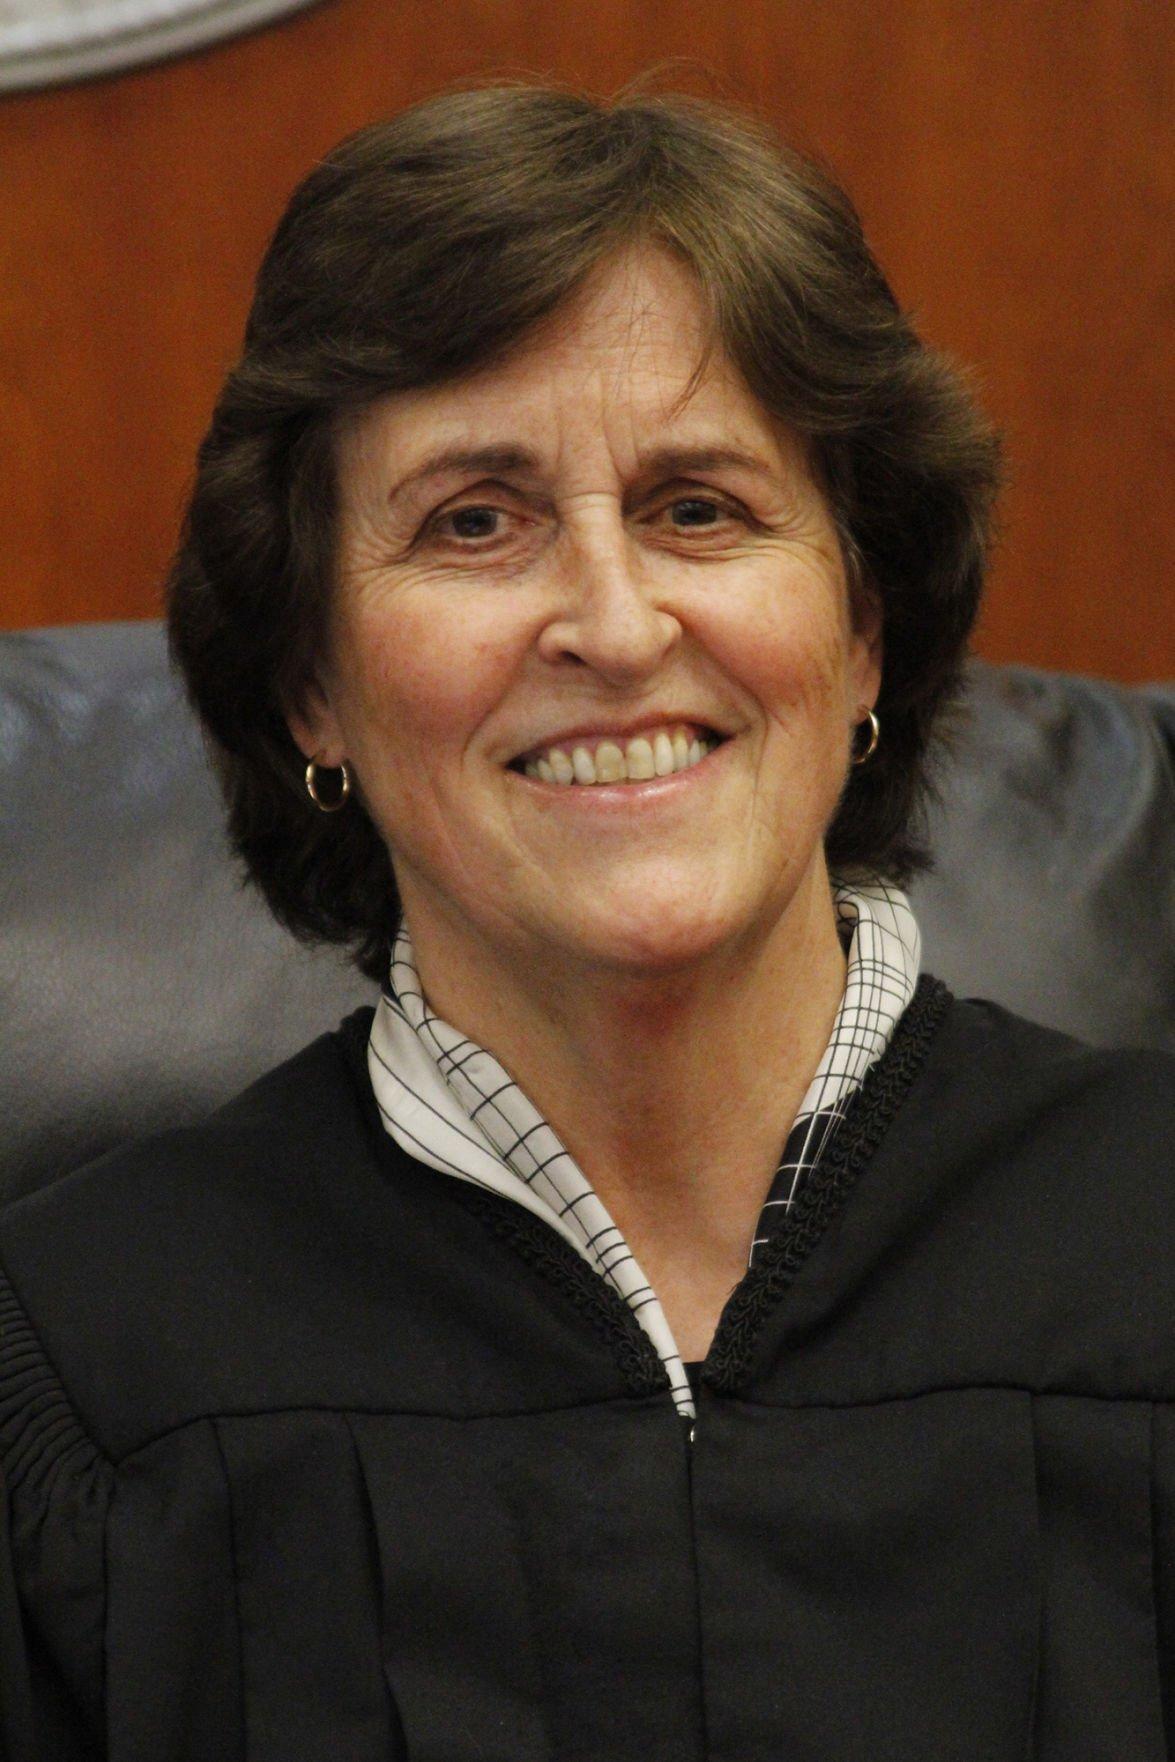 Judge Francisca P. Tisher